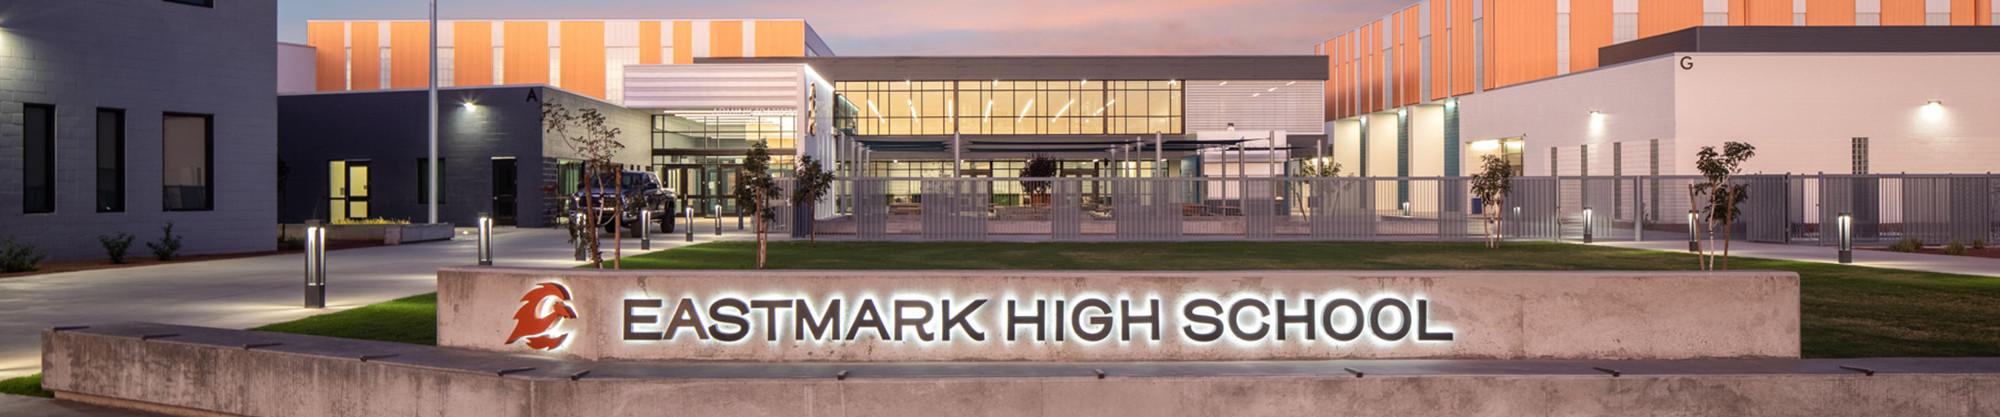 Eastmark High School front courtyard